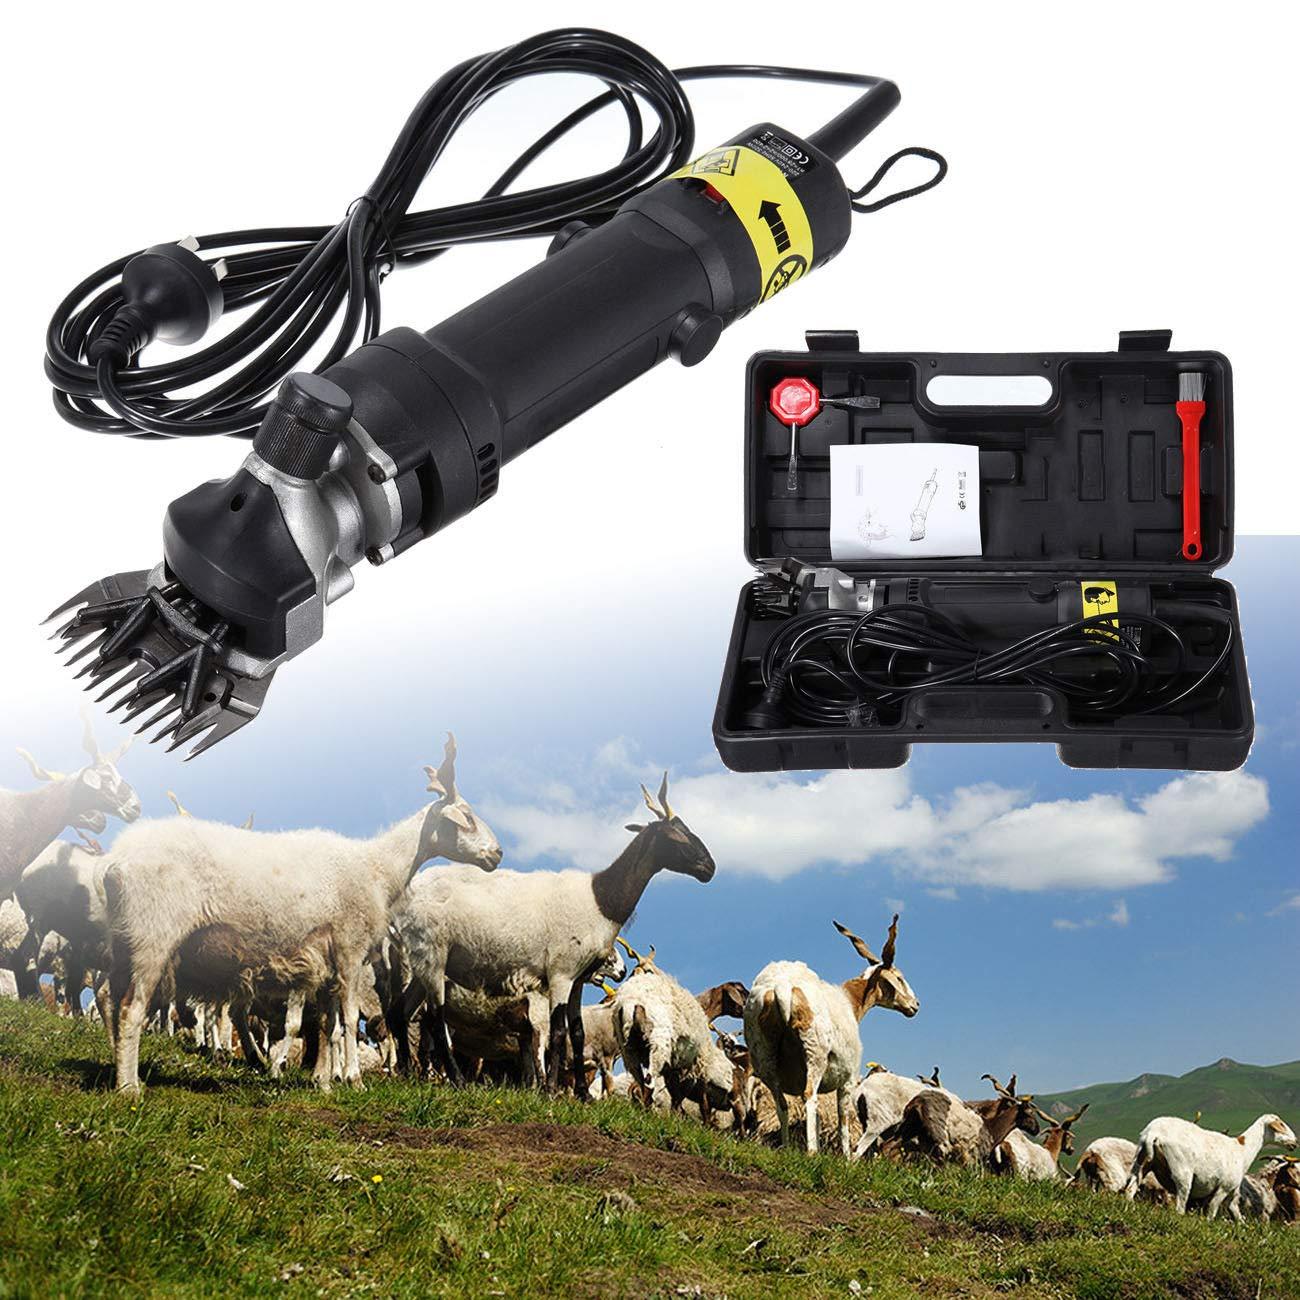 Ridgeyard 320W Electric Sheep Goat Irish Wolfhounds Clippers Shears Groomer Wool Shearing for Livestock Pet Animal Farm.